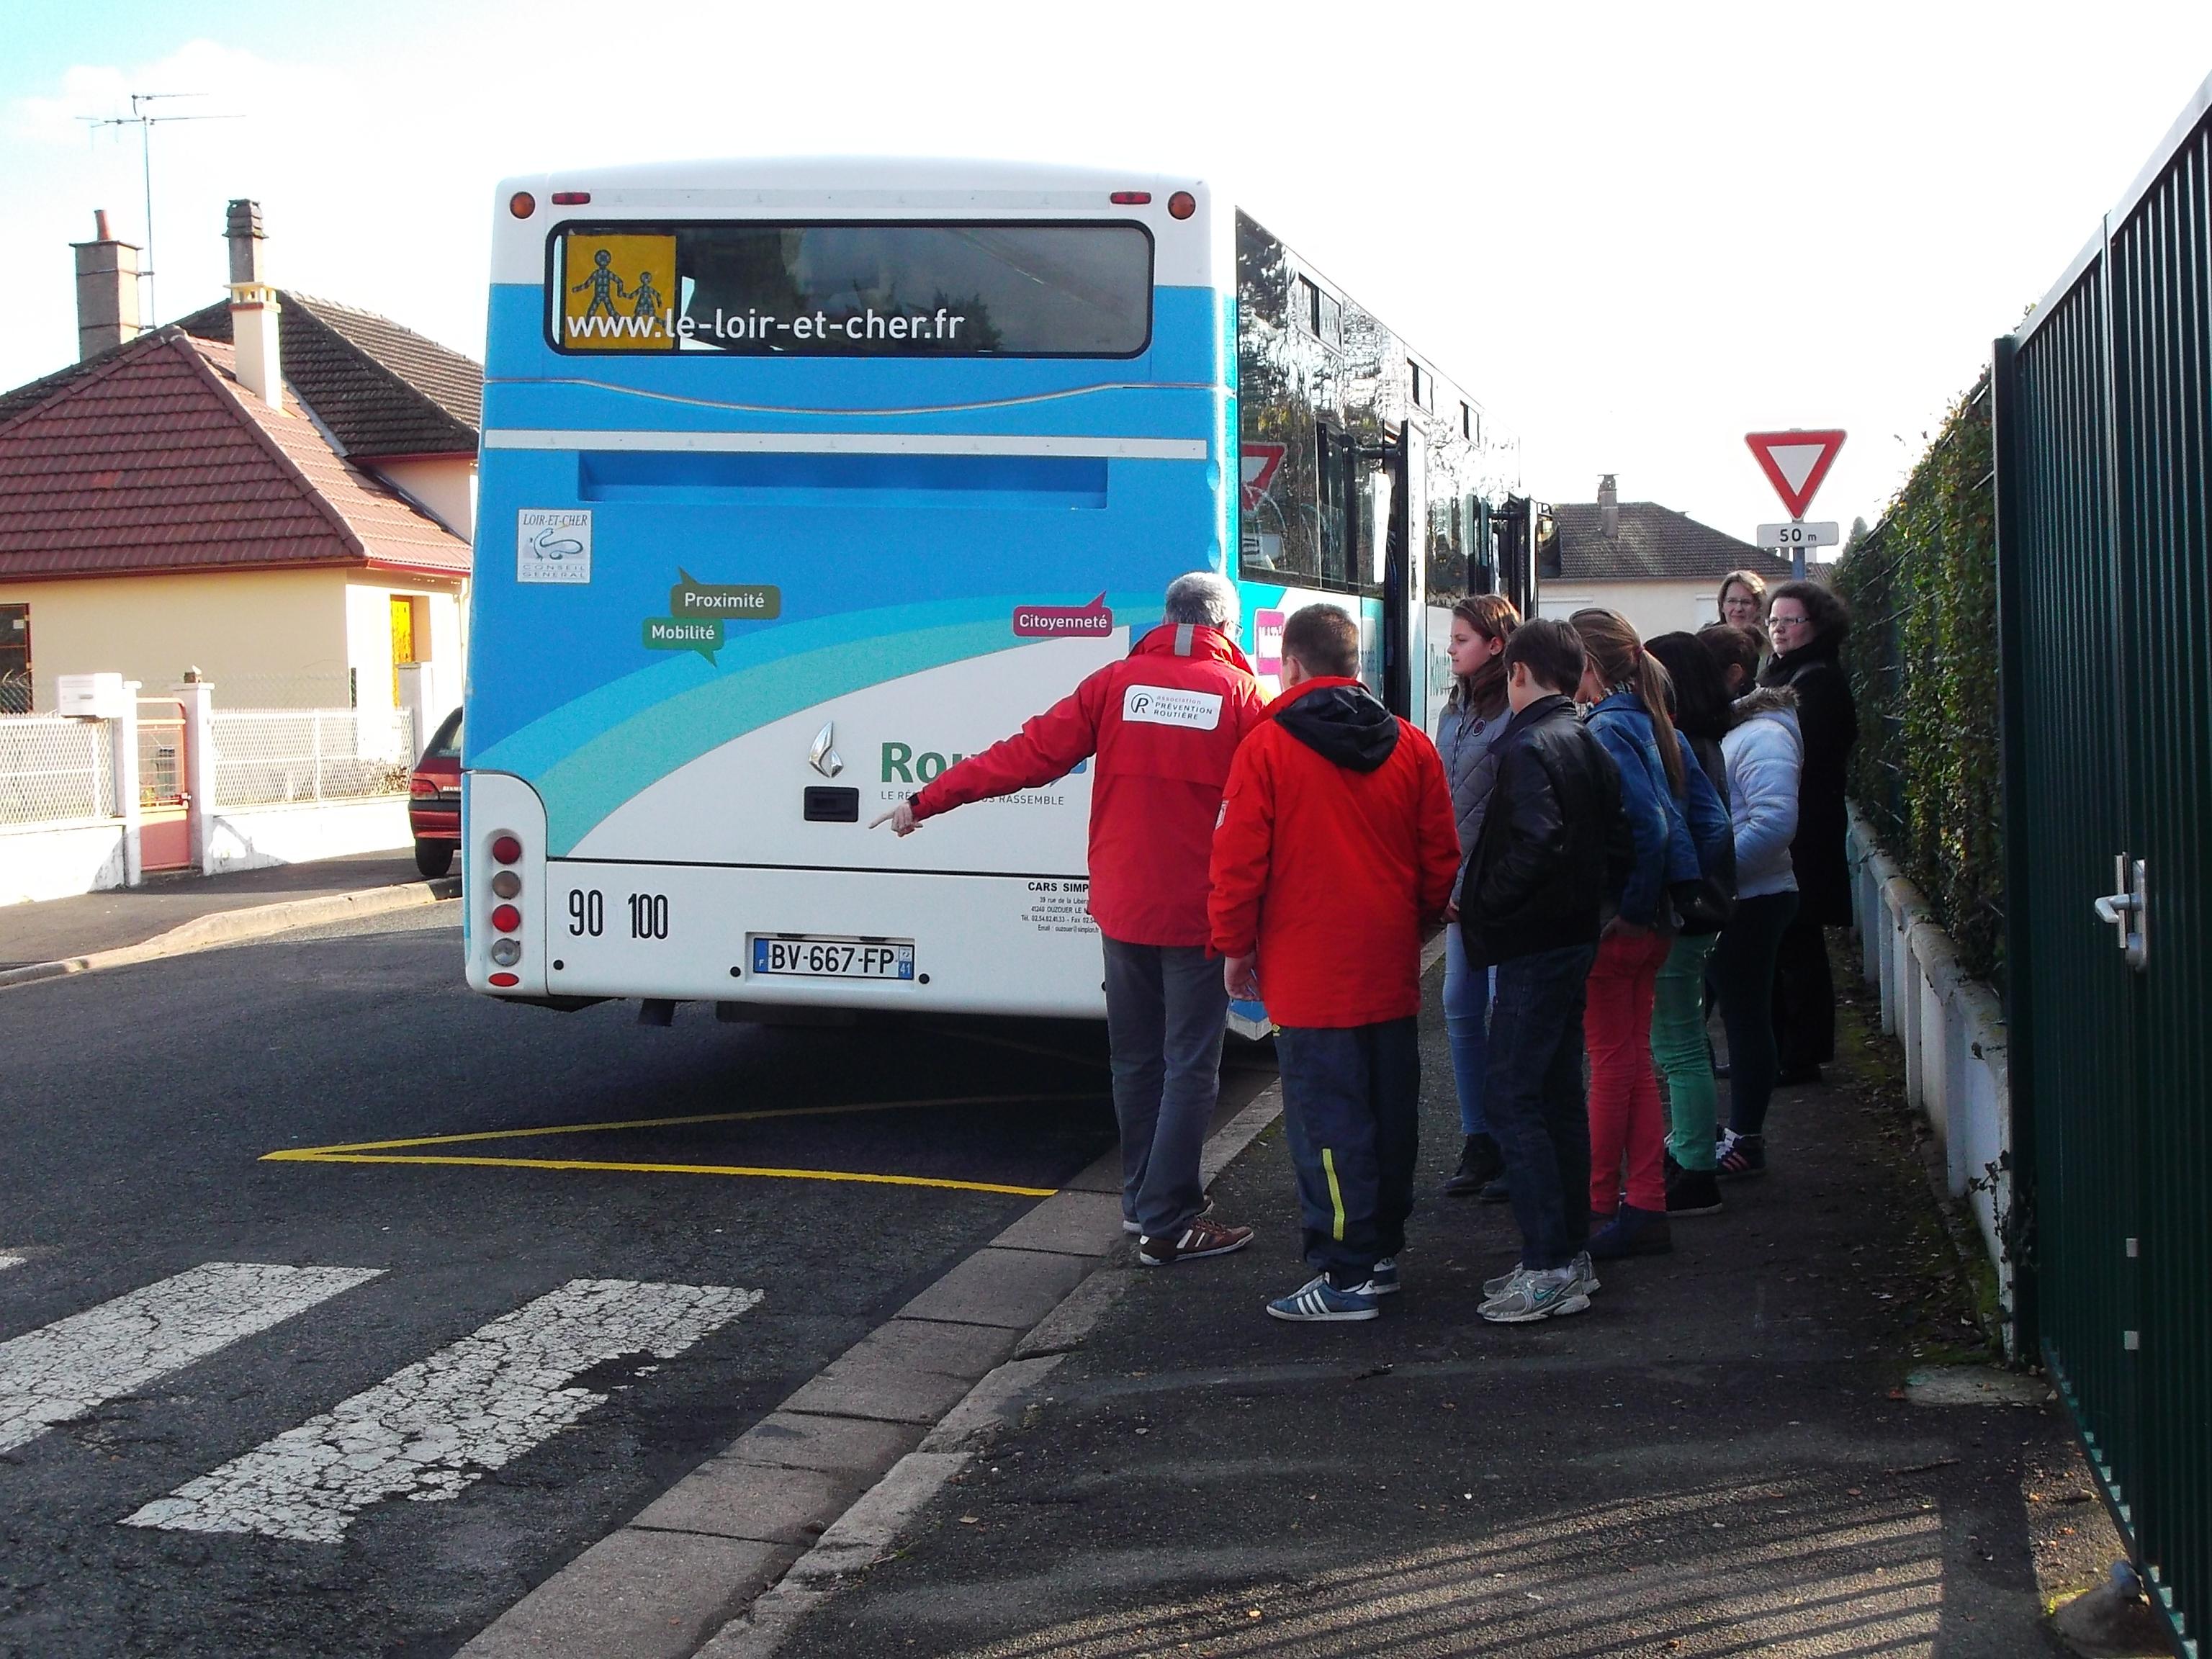 TransportsAttitudeClgMondoubleau 017